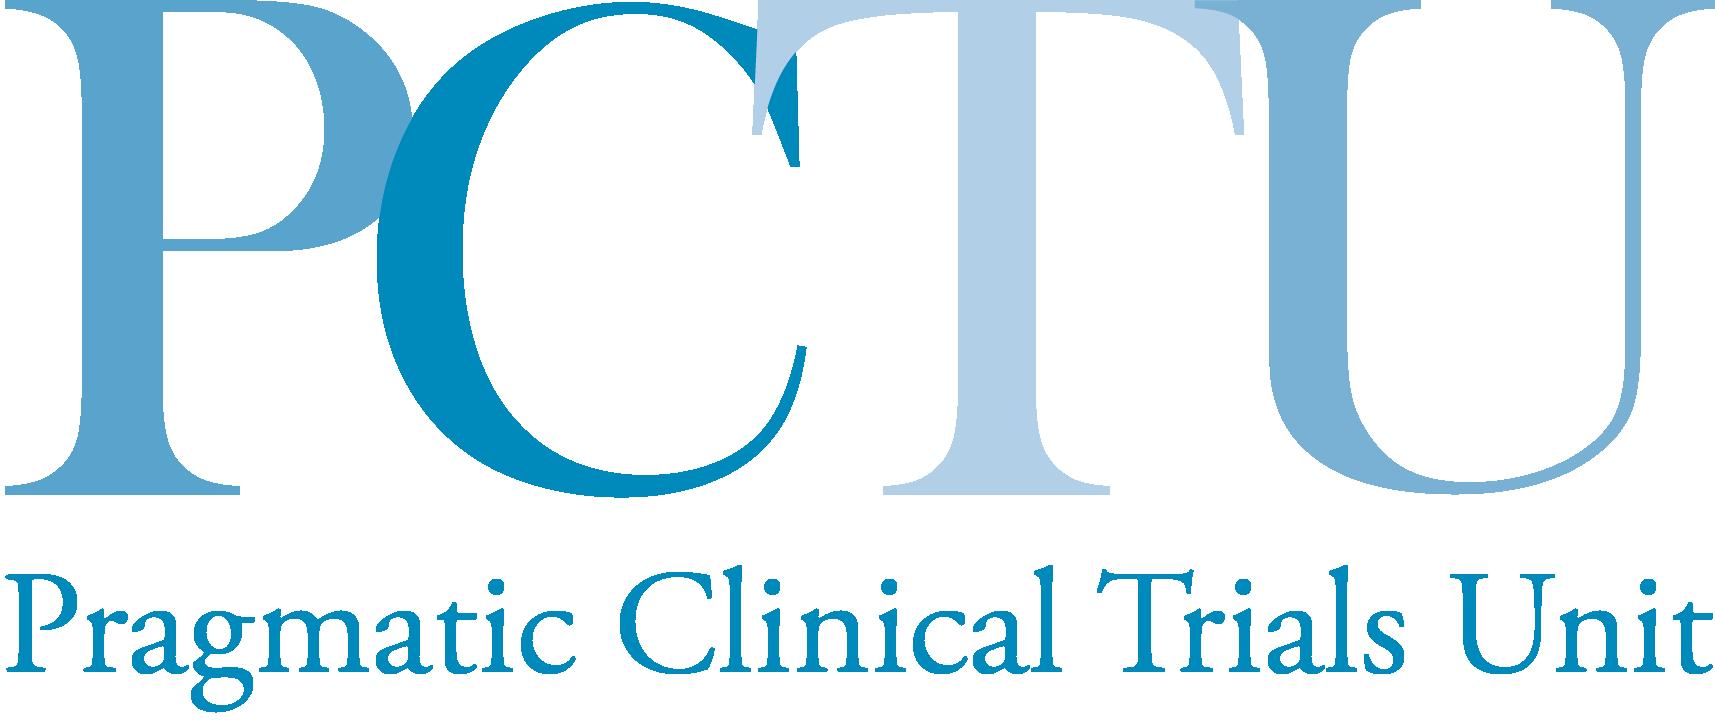 Pragmatic Clinical Trials Unit - Pragmatic Clinical Trials Unit